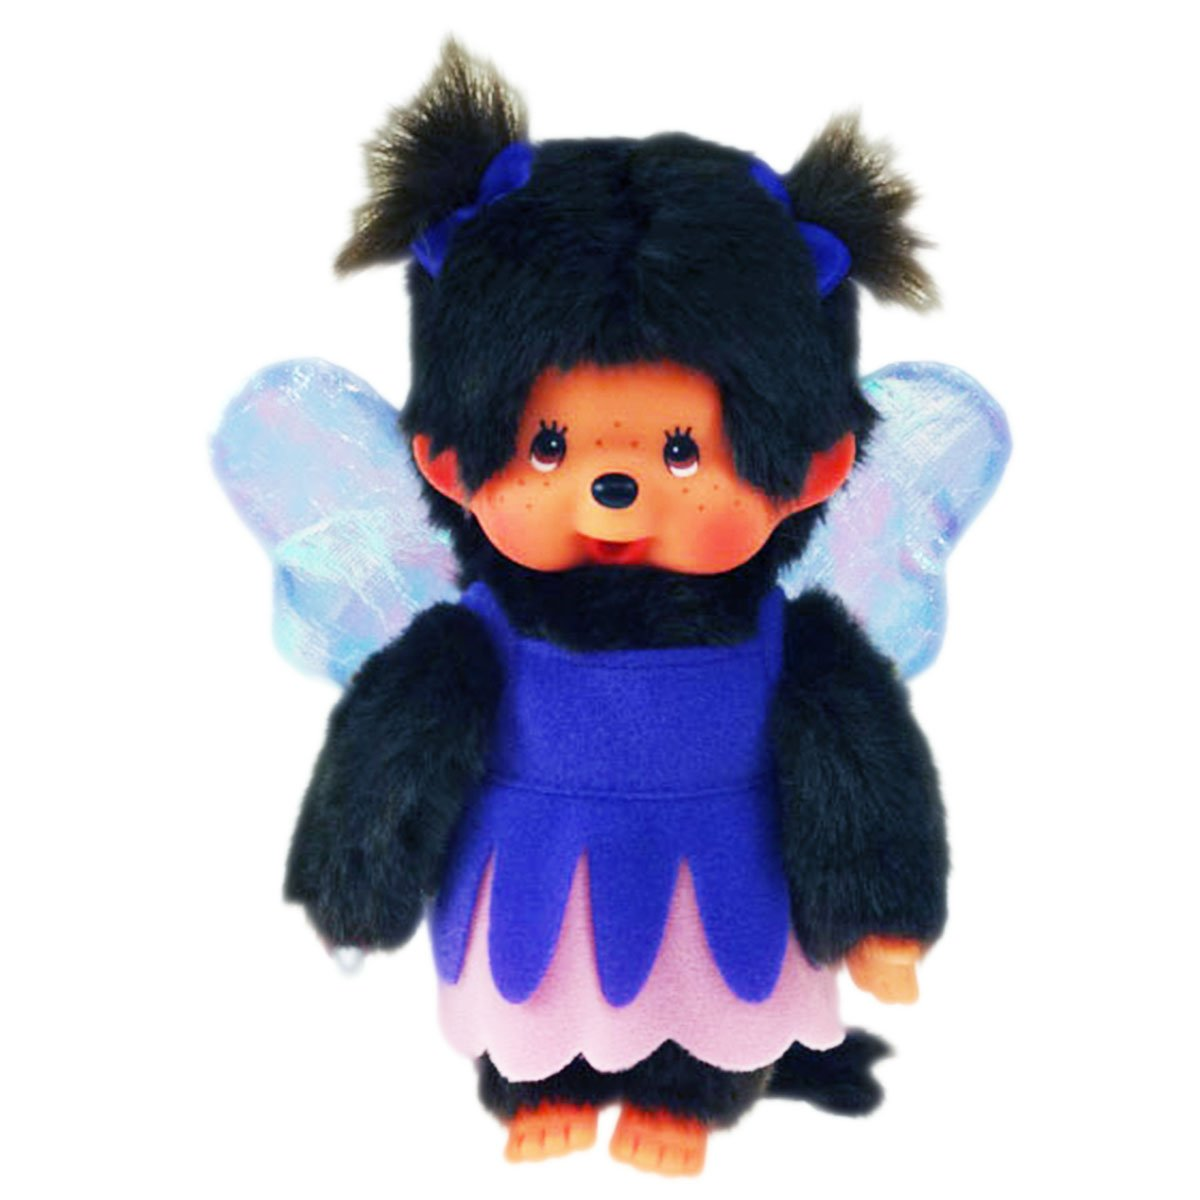 Monchhichi 23207 20 cm fata bambola Monchhichi 2320720cm fata bambola Sekiguchi